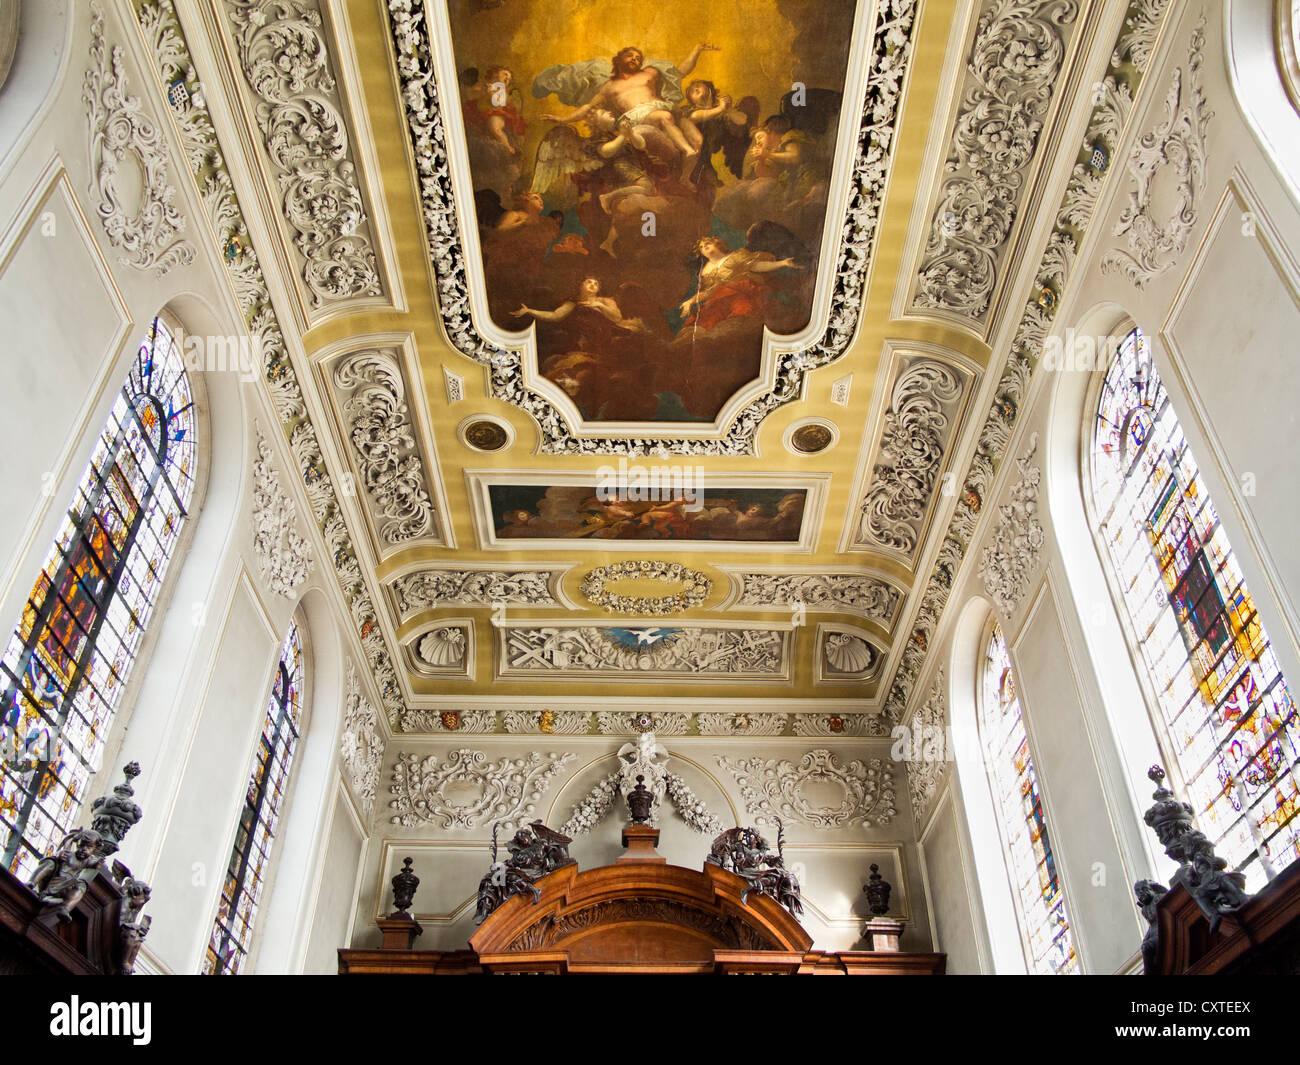 Interior of Trinity College Chapel, Oxford 2 - Stock Image